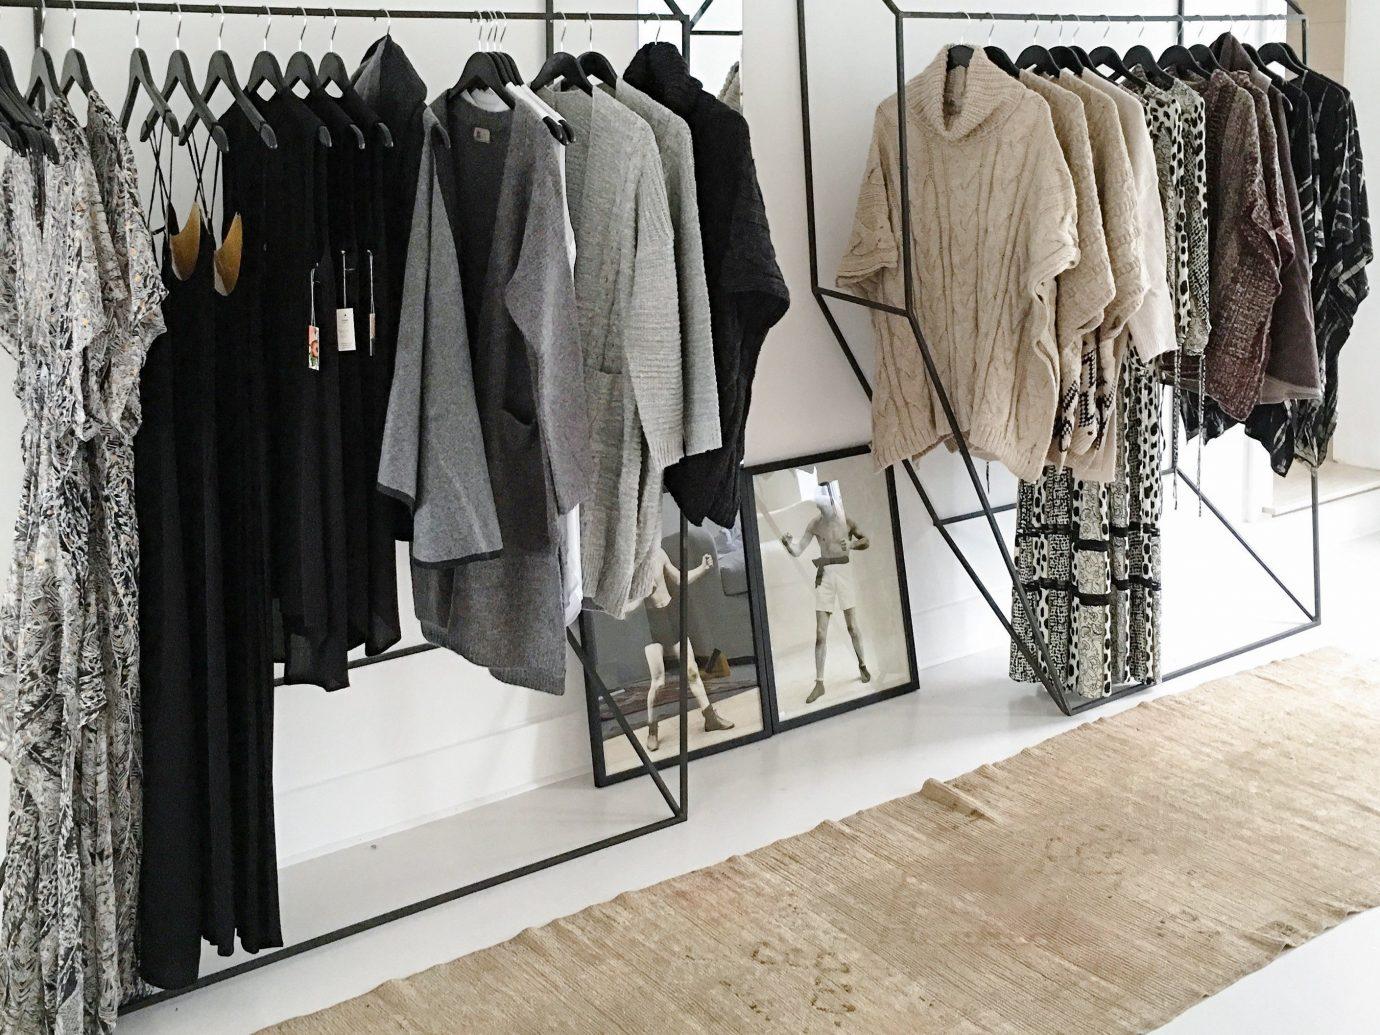 Mountains + Skiing Trip Ideas clothes hanger furniture Boutique room closet floor fashion shelf flooring outerwear interior design wardrobe buyer fashion design shelving clothes rack